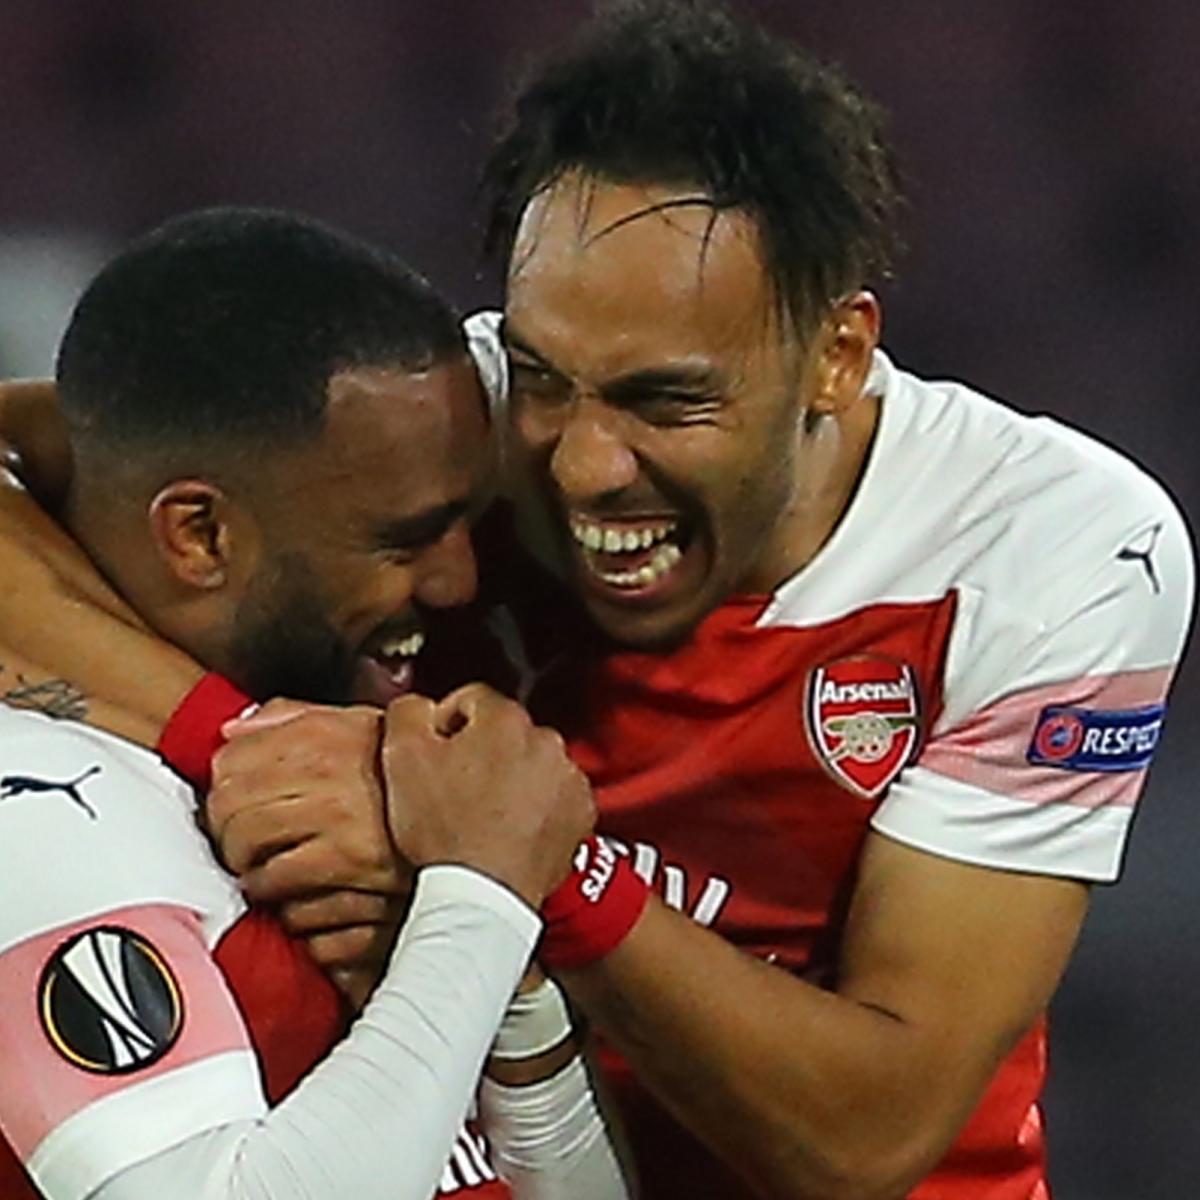 Champions League 2019 Live Stream Odds For Tuesday S: Arsenal Vs. Valencia: Odds, Live Stream, TV Info For